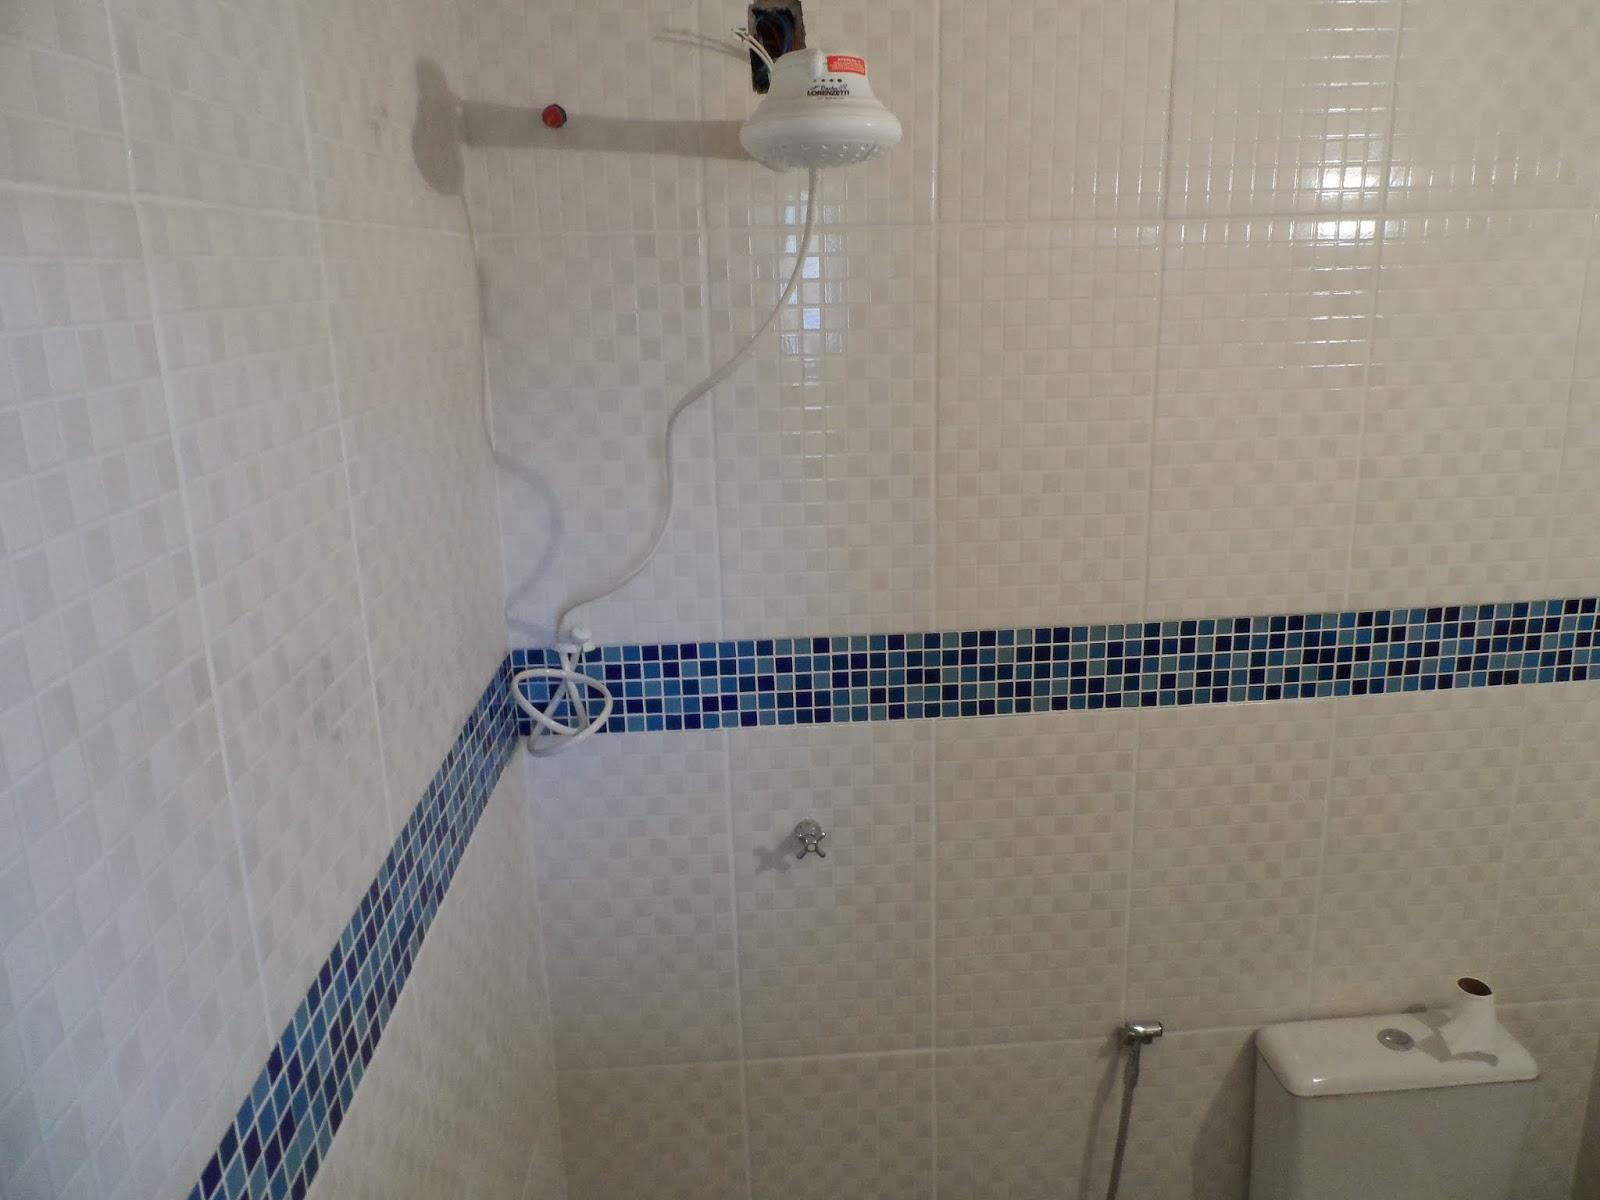 Minha casa te inspira: Banheiro azul e Branco #384960 1600x1200 Banheiro Branco E Laranja